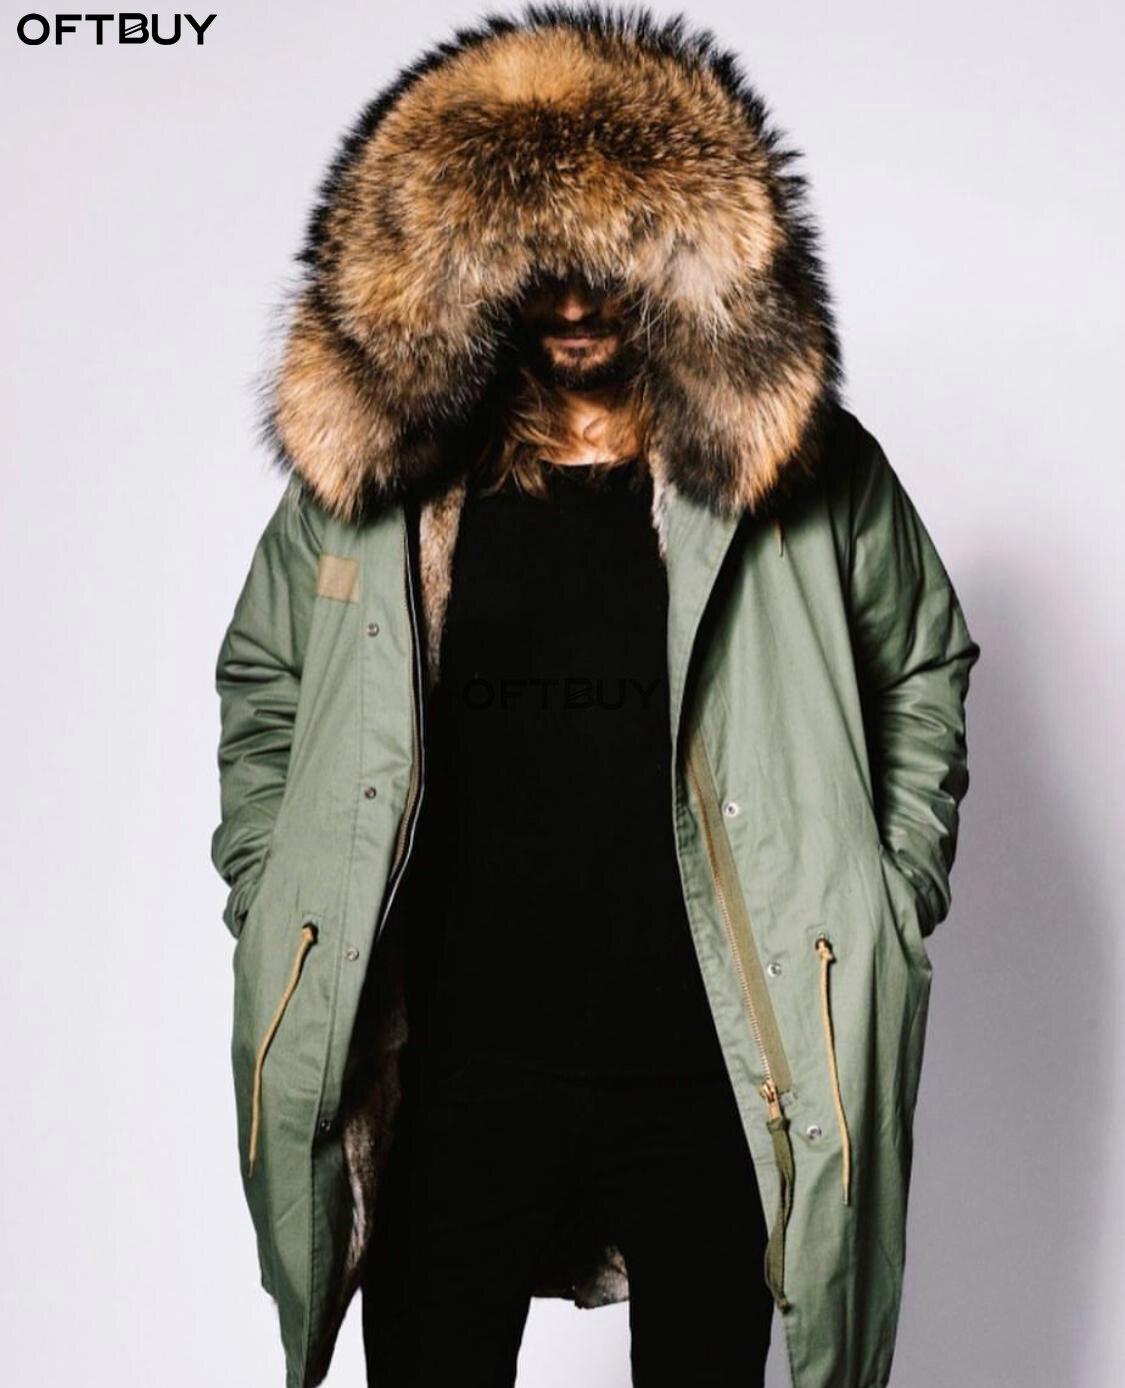 OFTBUY 2019 Plus Size Winter Jacket Men Parka Real Fur Coat Big Natural Raccoon Fur Collar Hood Thick Warm Outerwear Streetwear